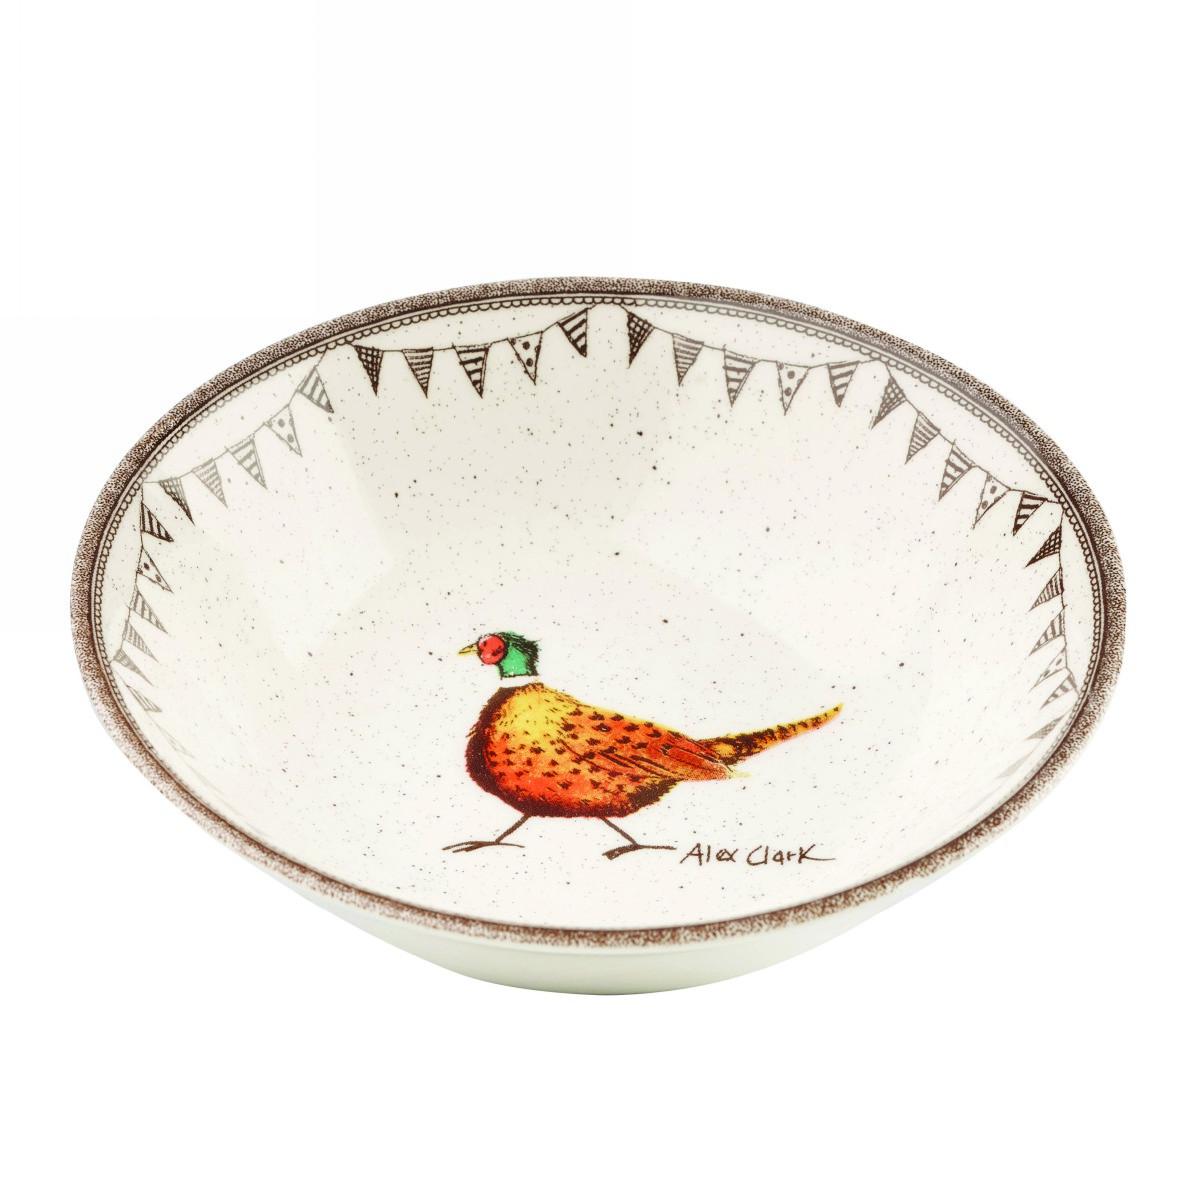 Тарелка для каши Churchill 15 см Живая природа от Алекс Кларк